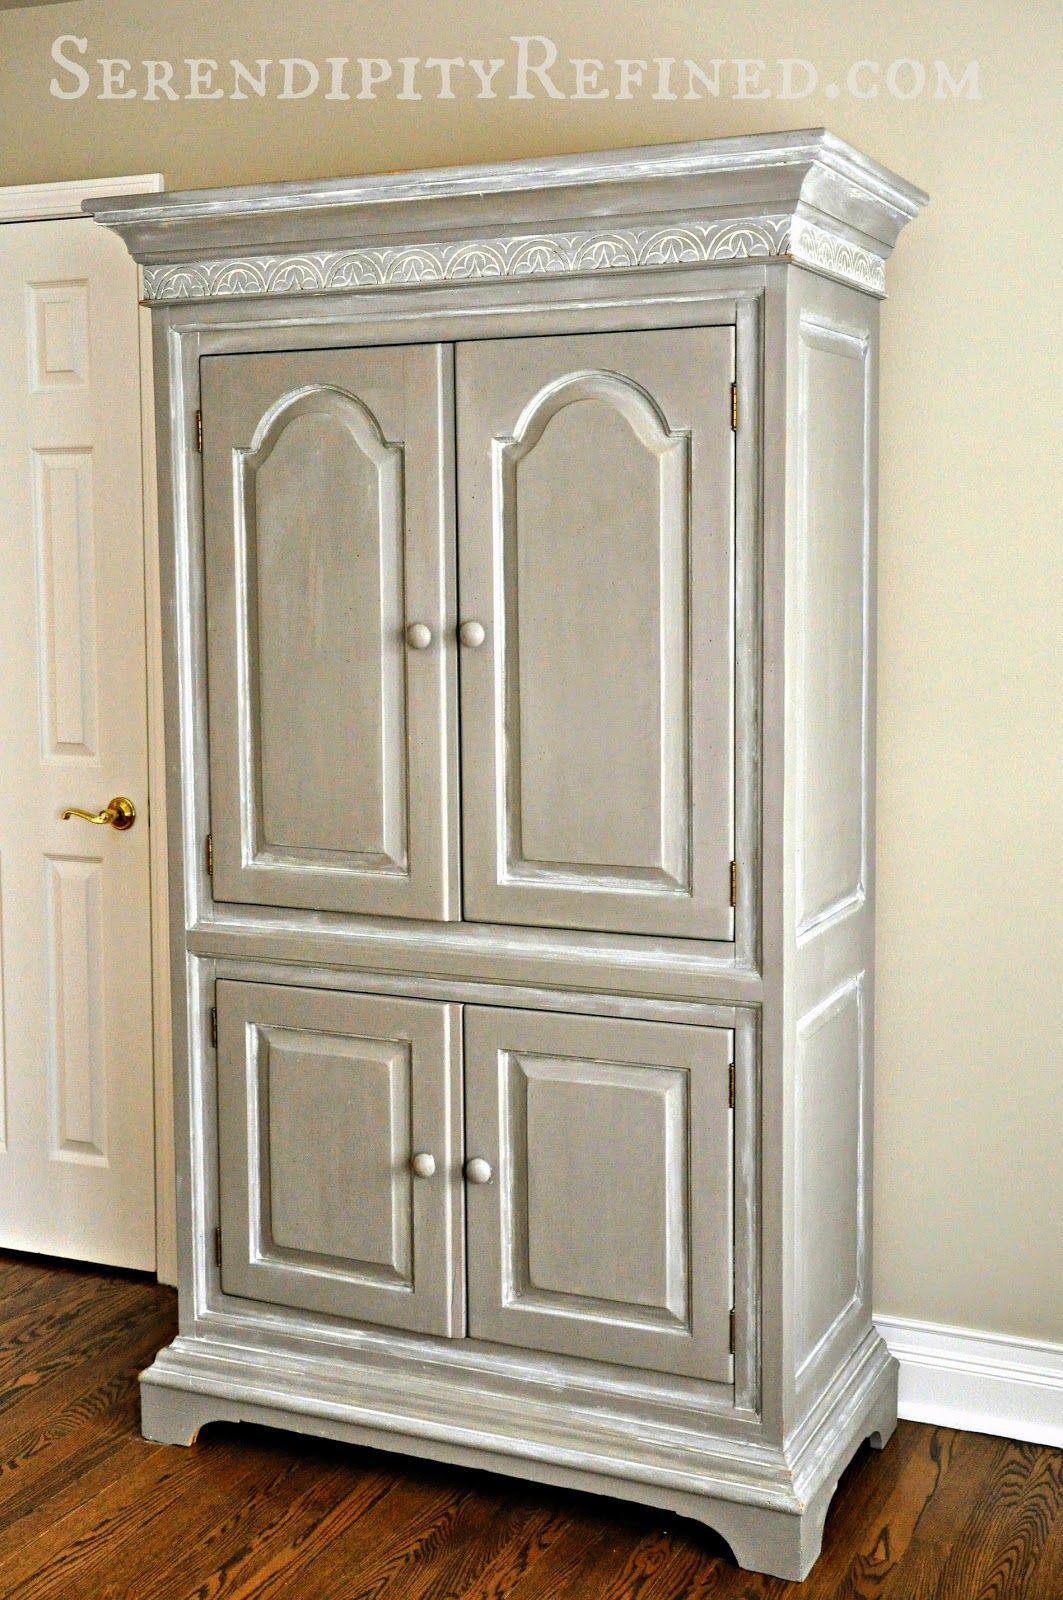 Serendipity Refined Blog Reader Painted Furniture DIY